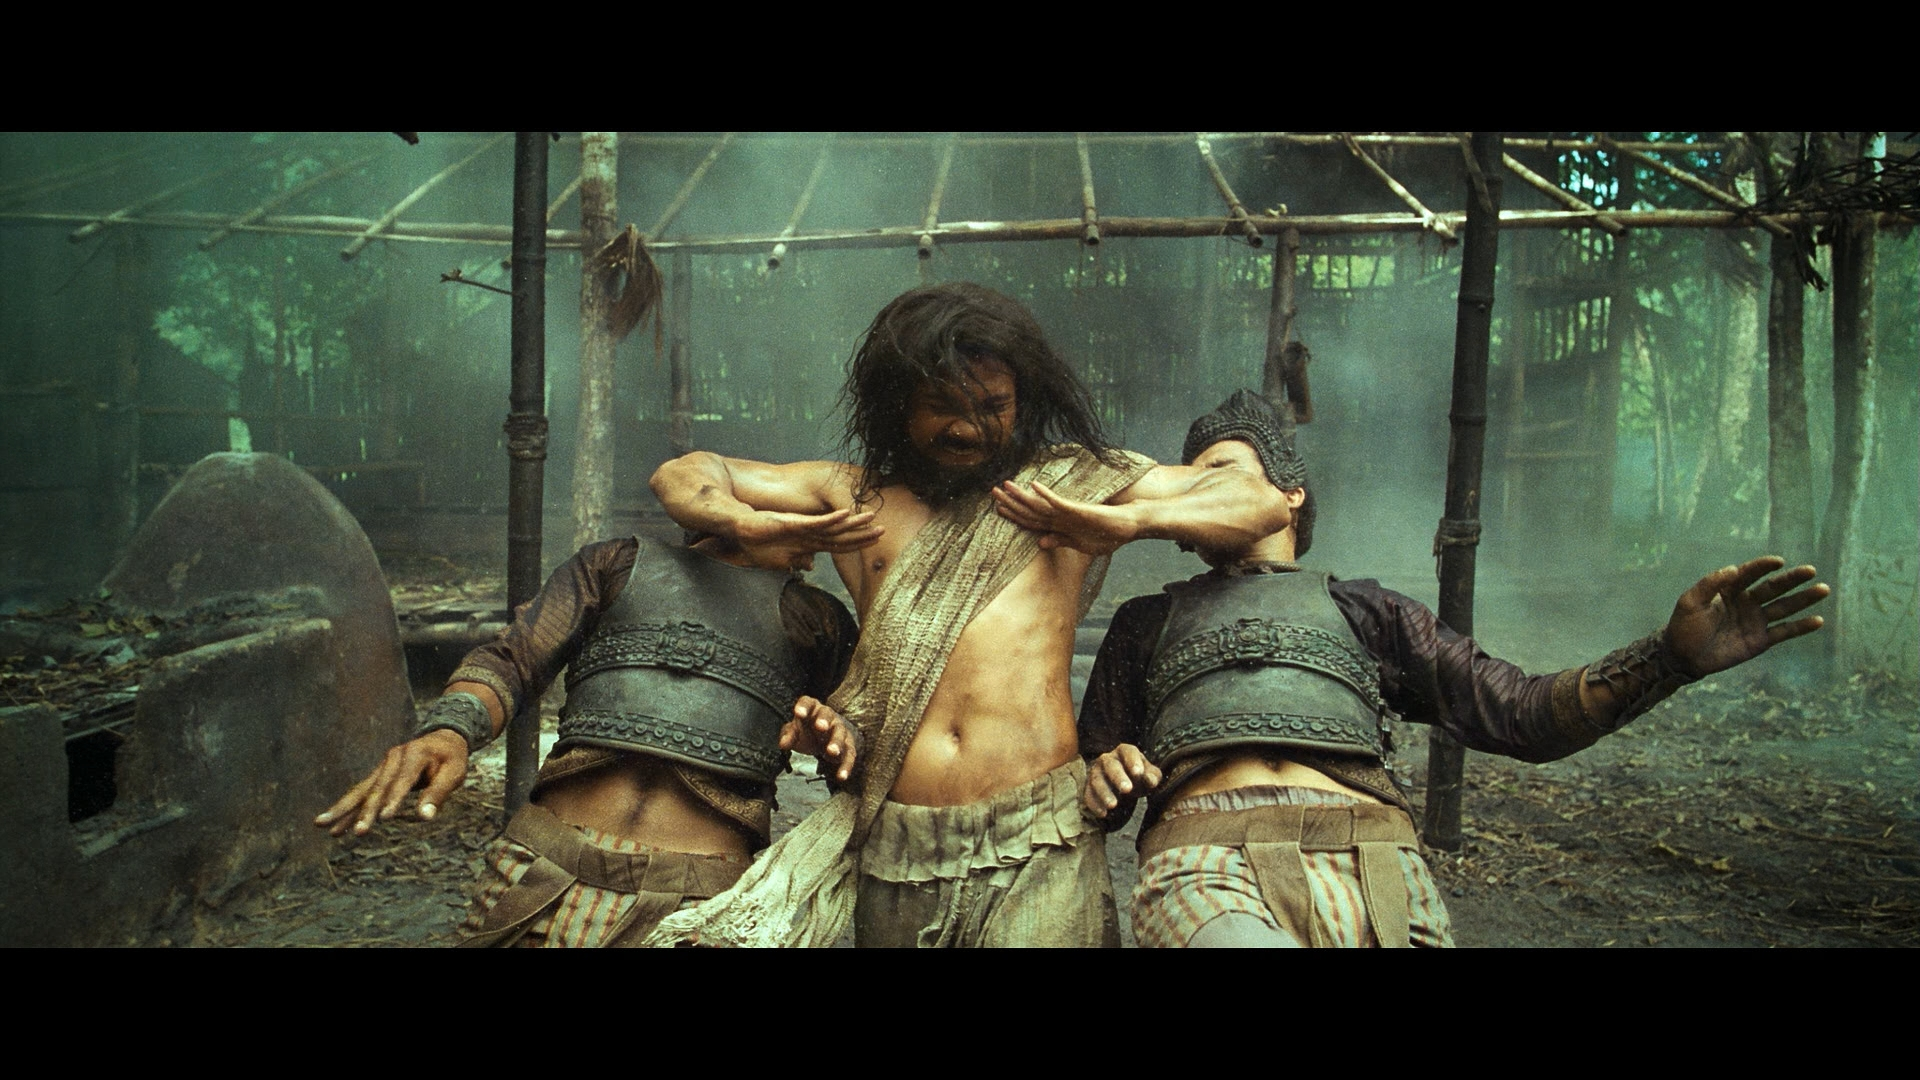 Ong-Bak 3 Pics, Movie Collection